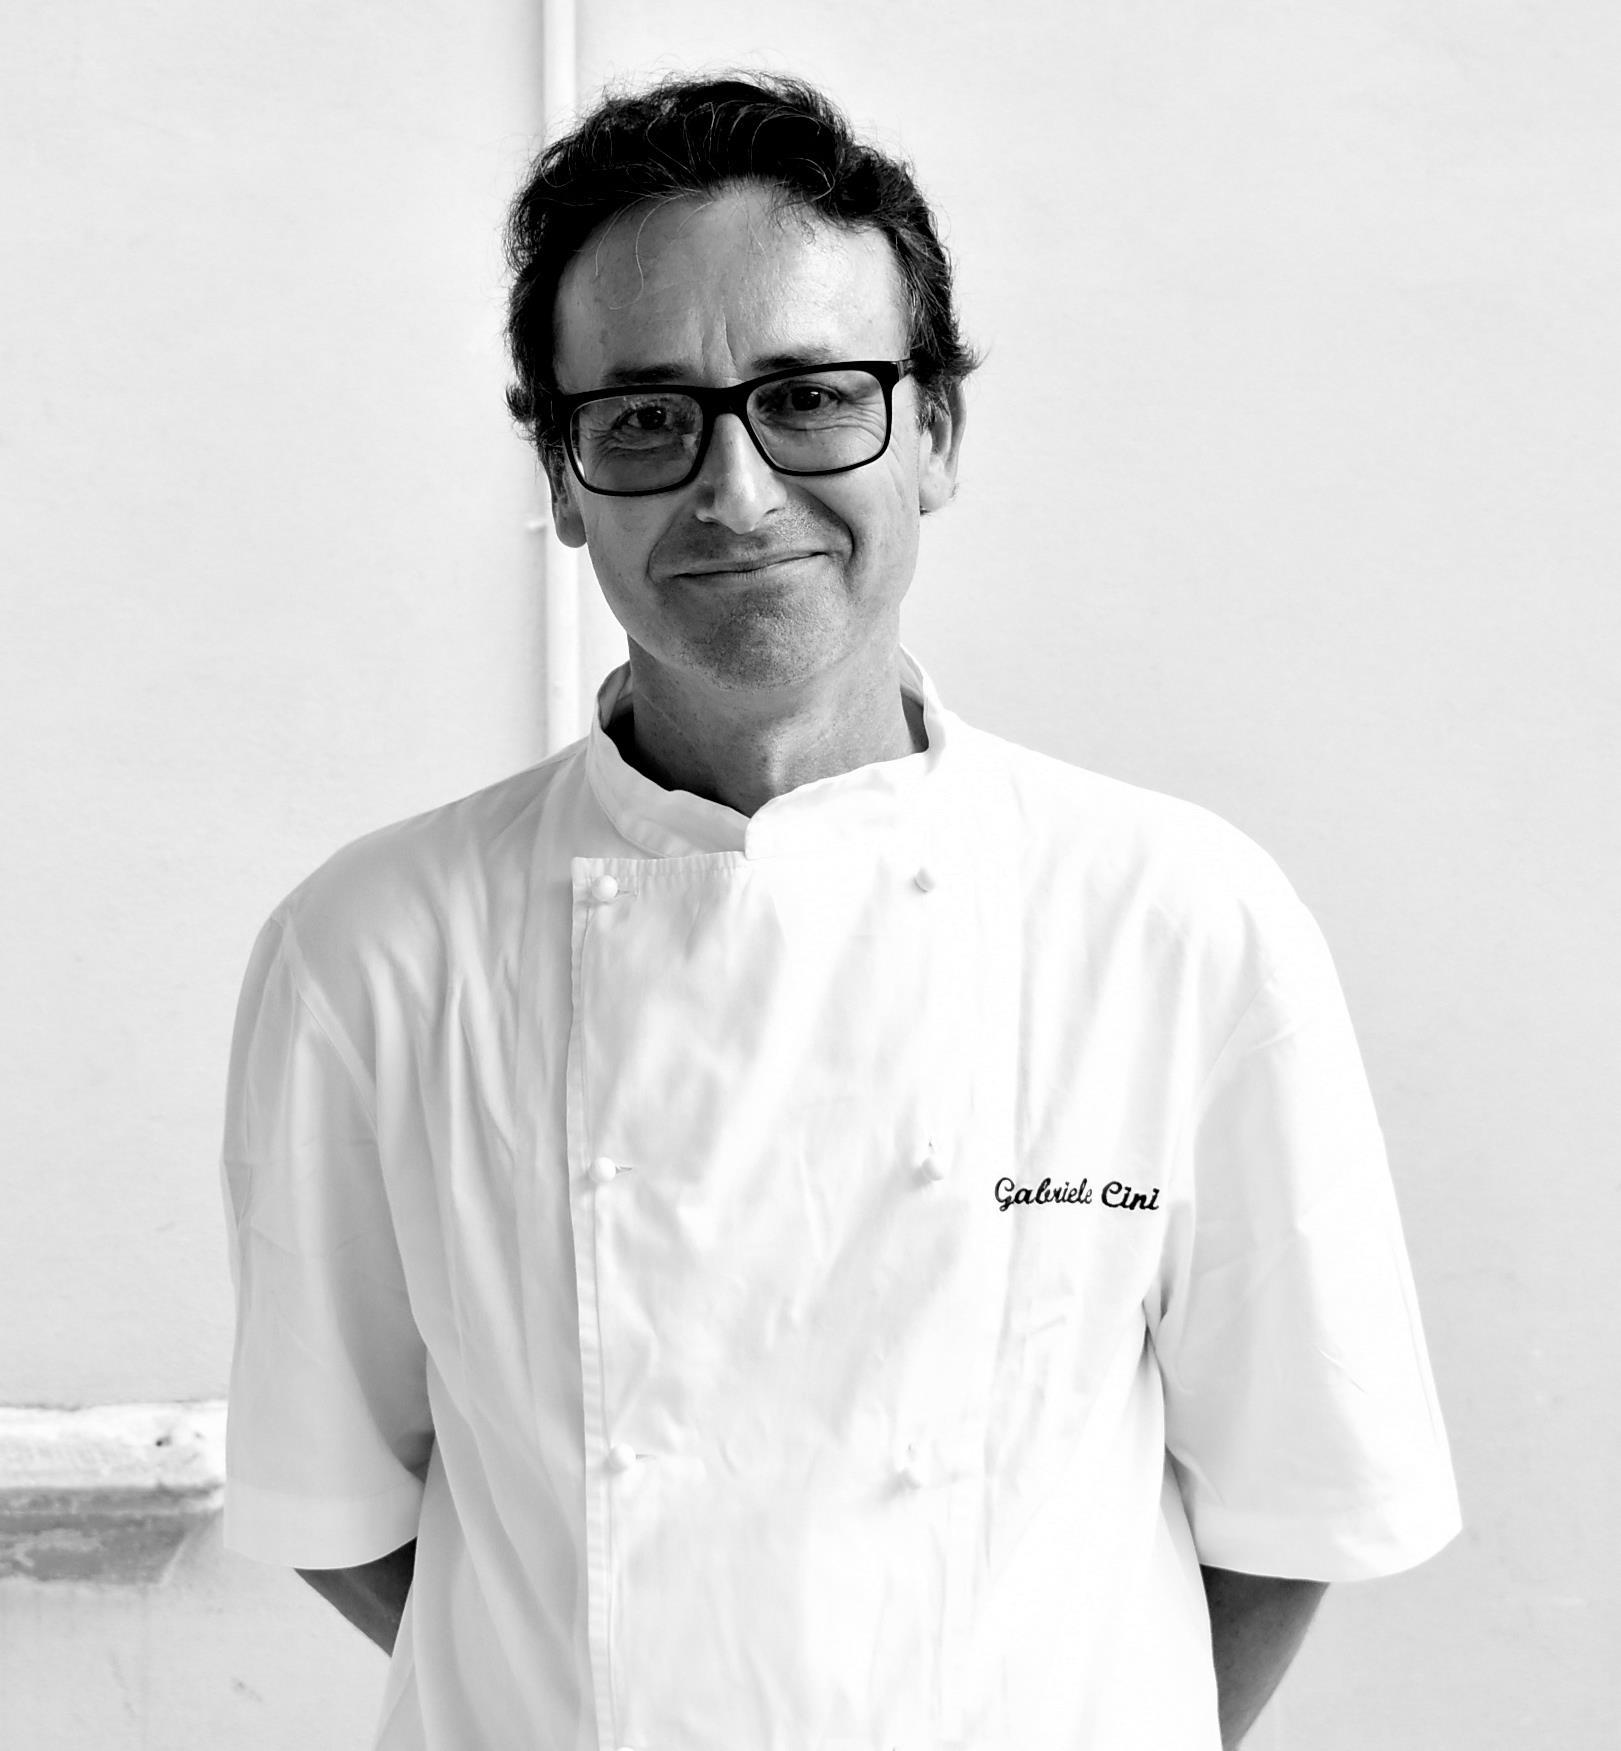 Gabriele Cini chef